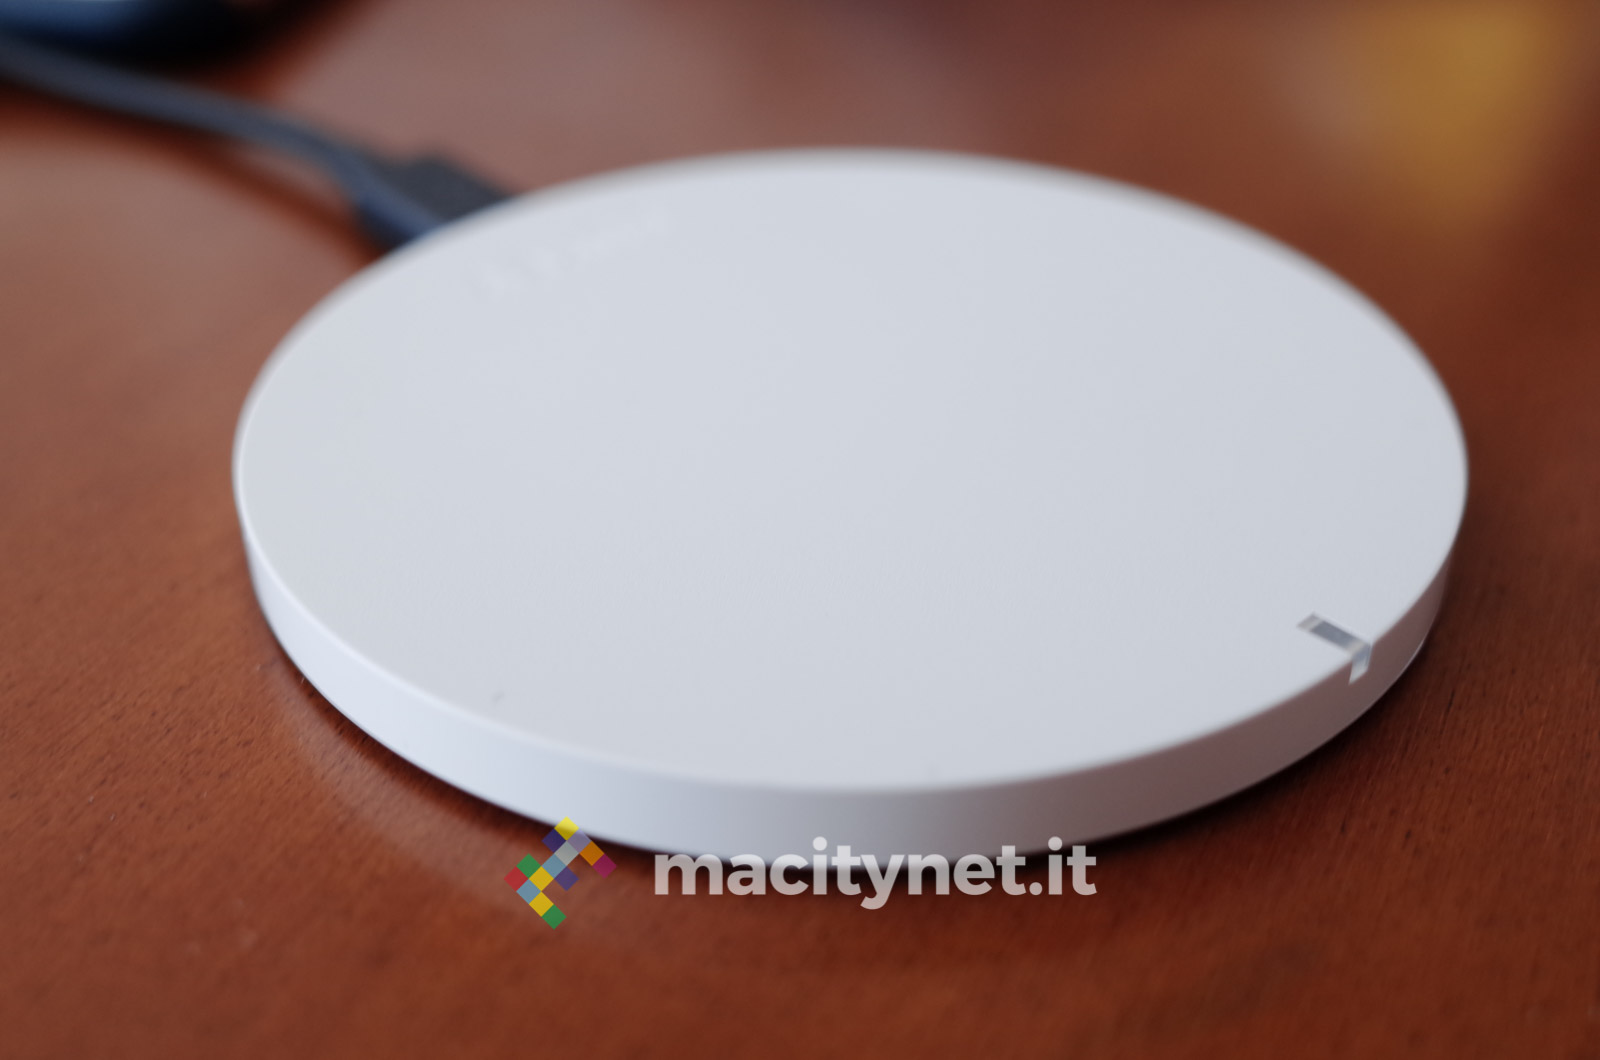 Recensione caricabatterie wireless Qi di Aukey